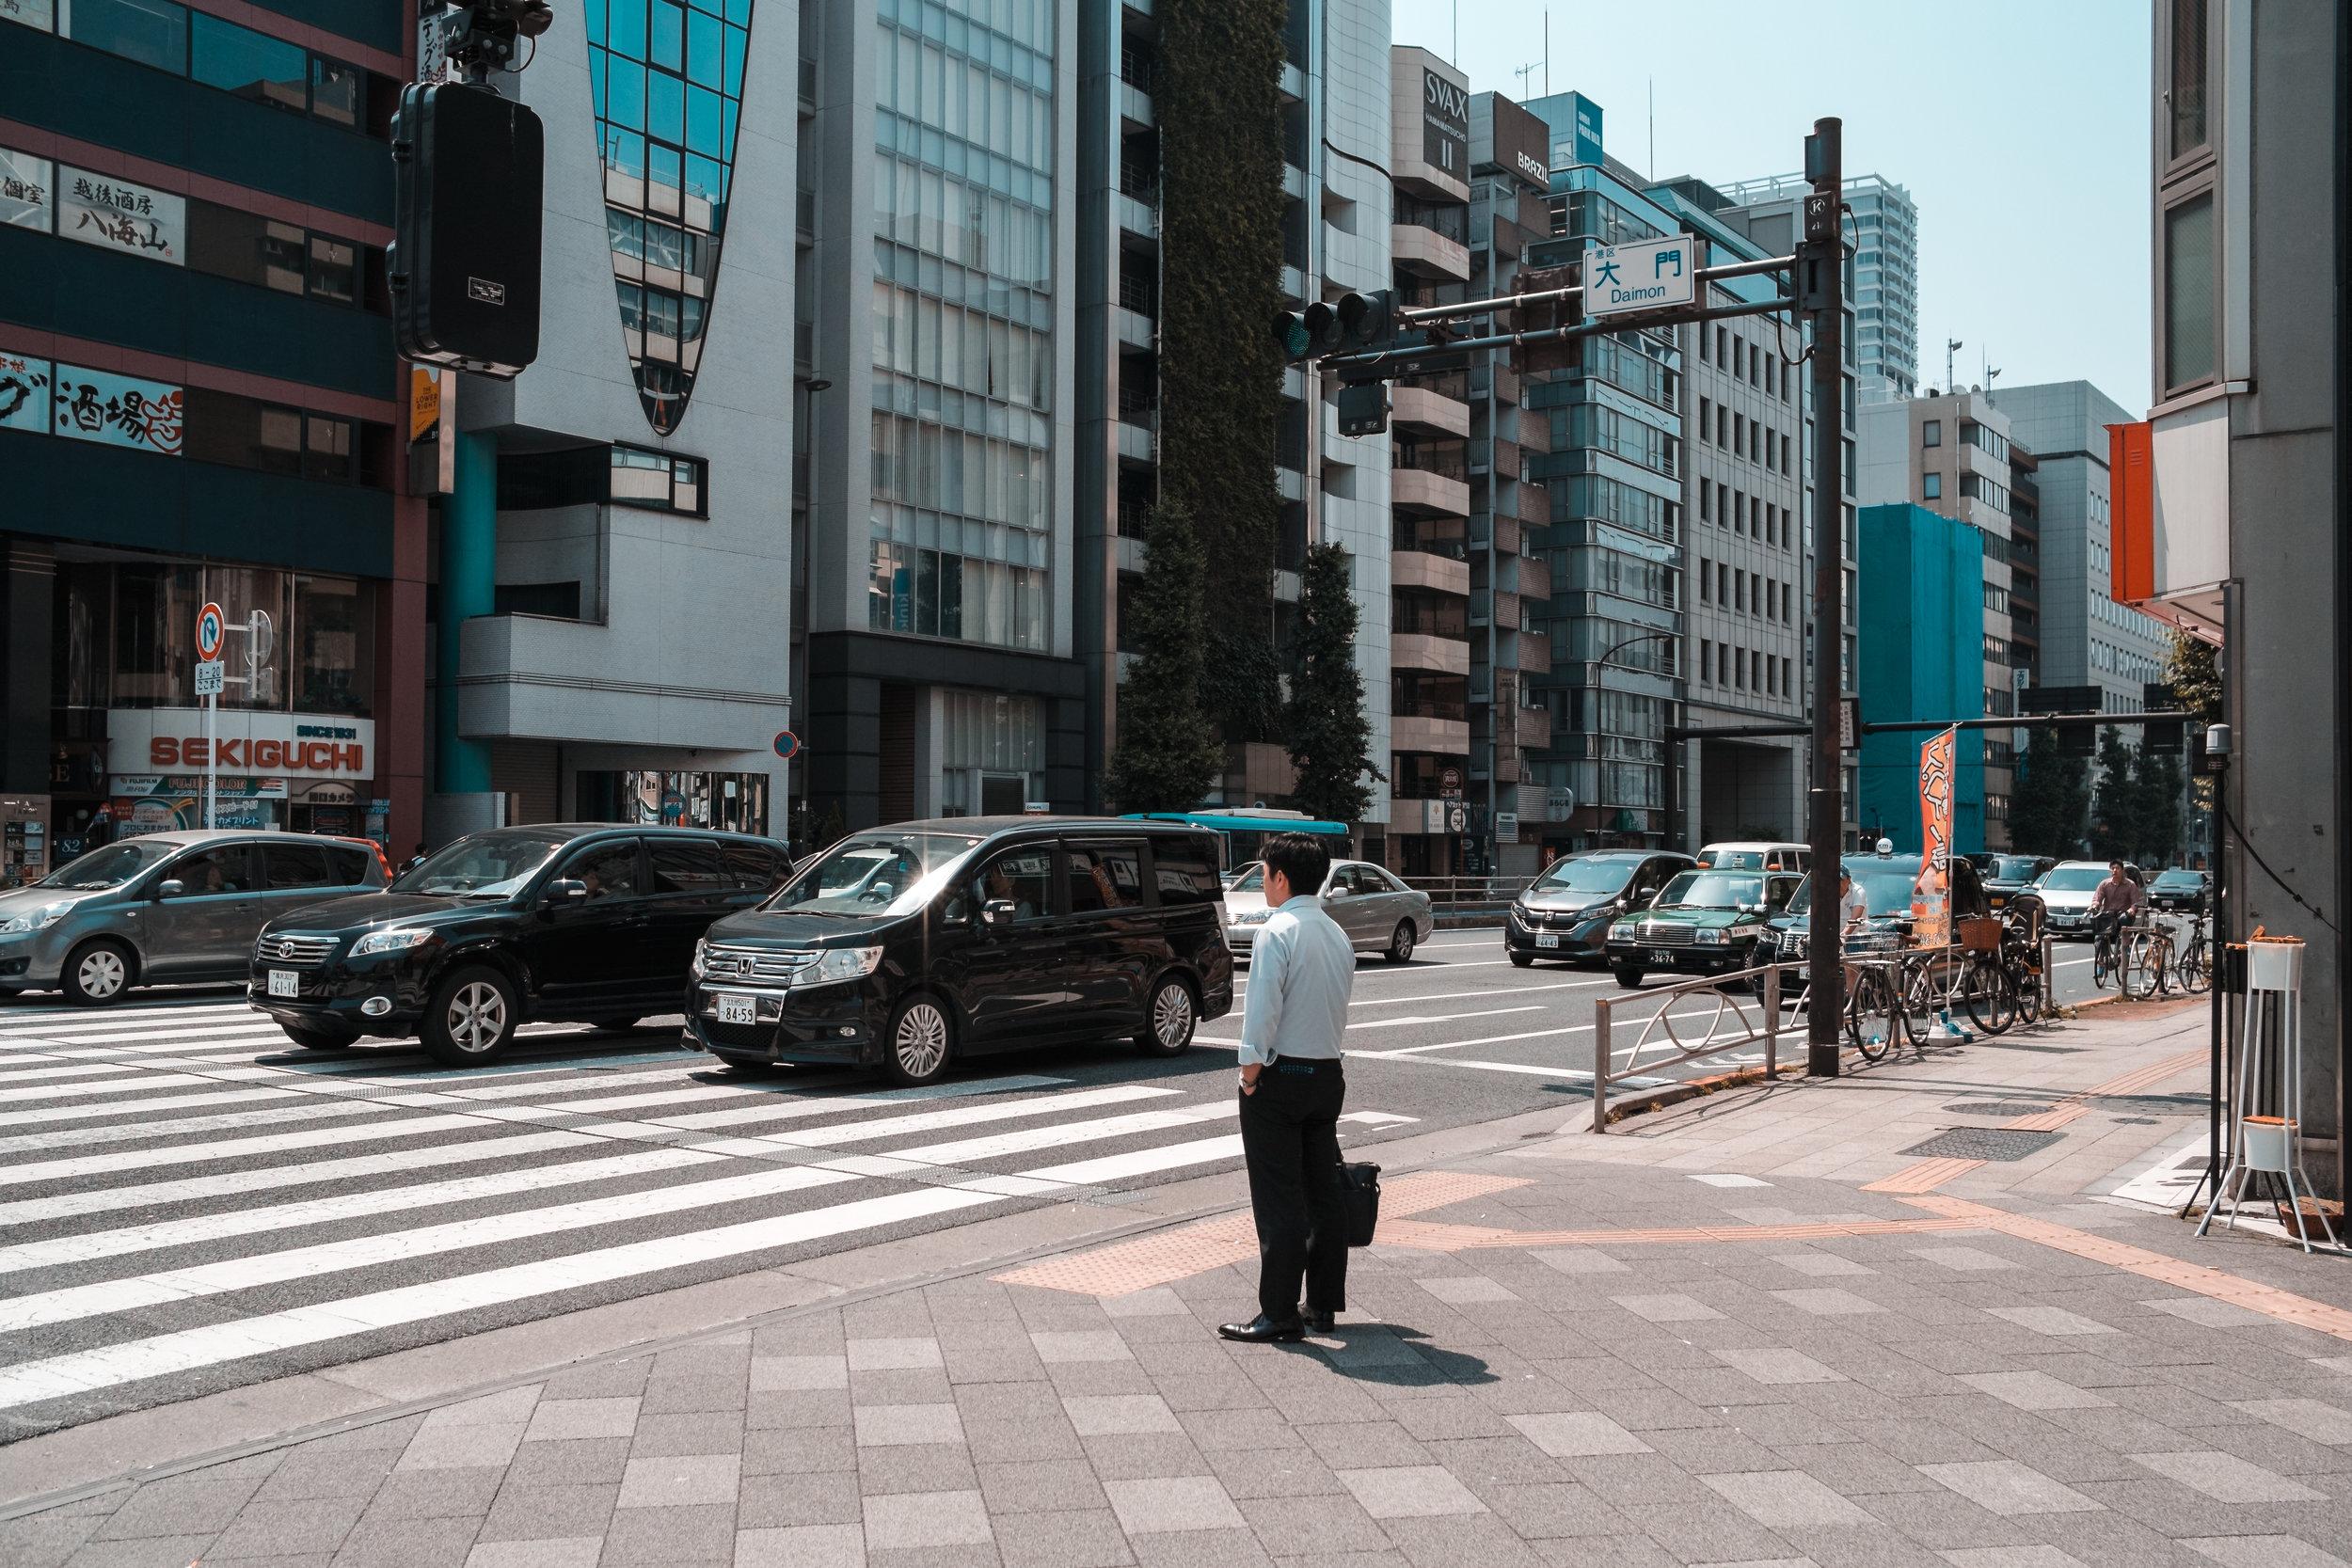 TokyoJapan_2018_AdamDillon_DSCF9350.jpg